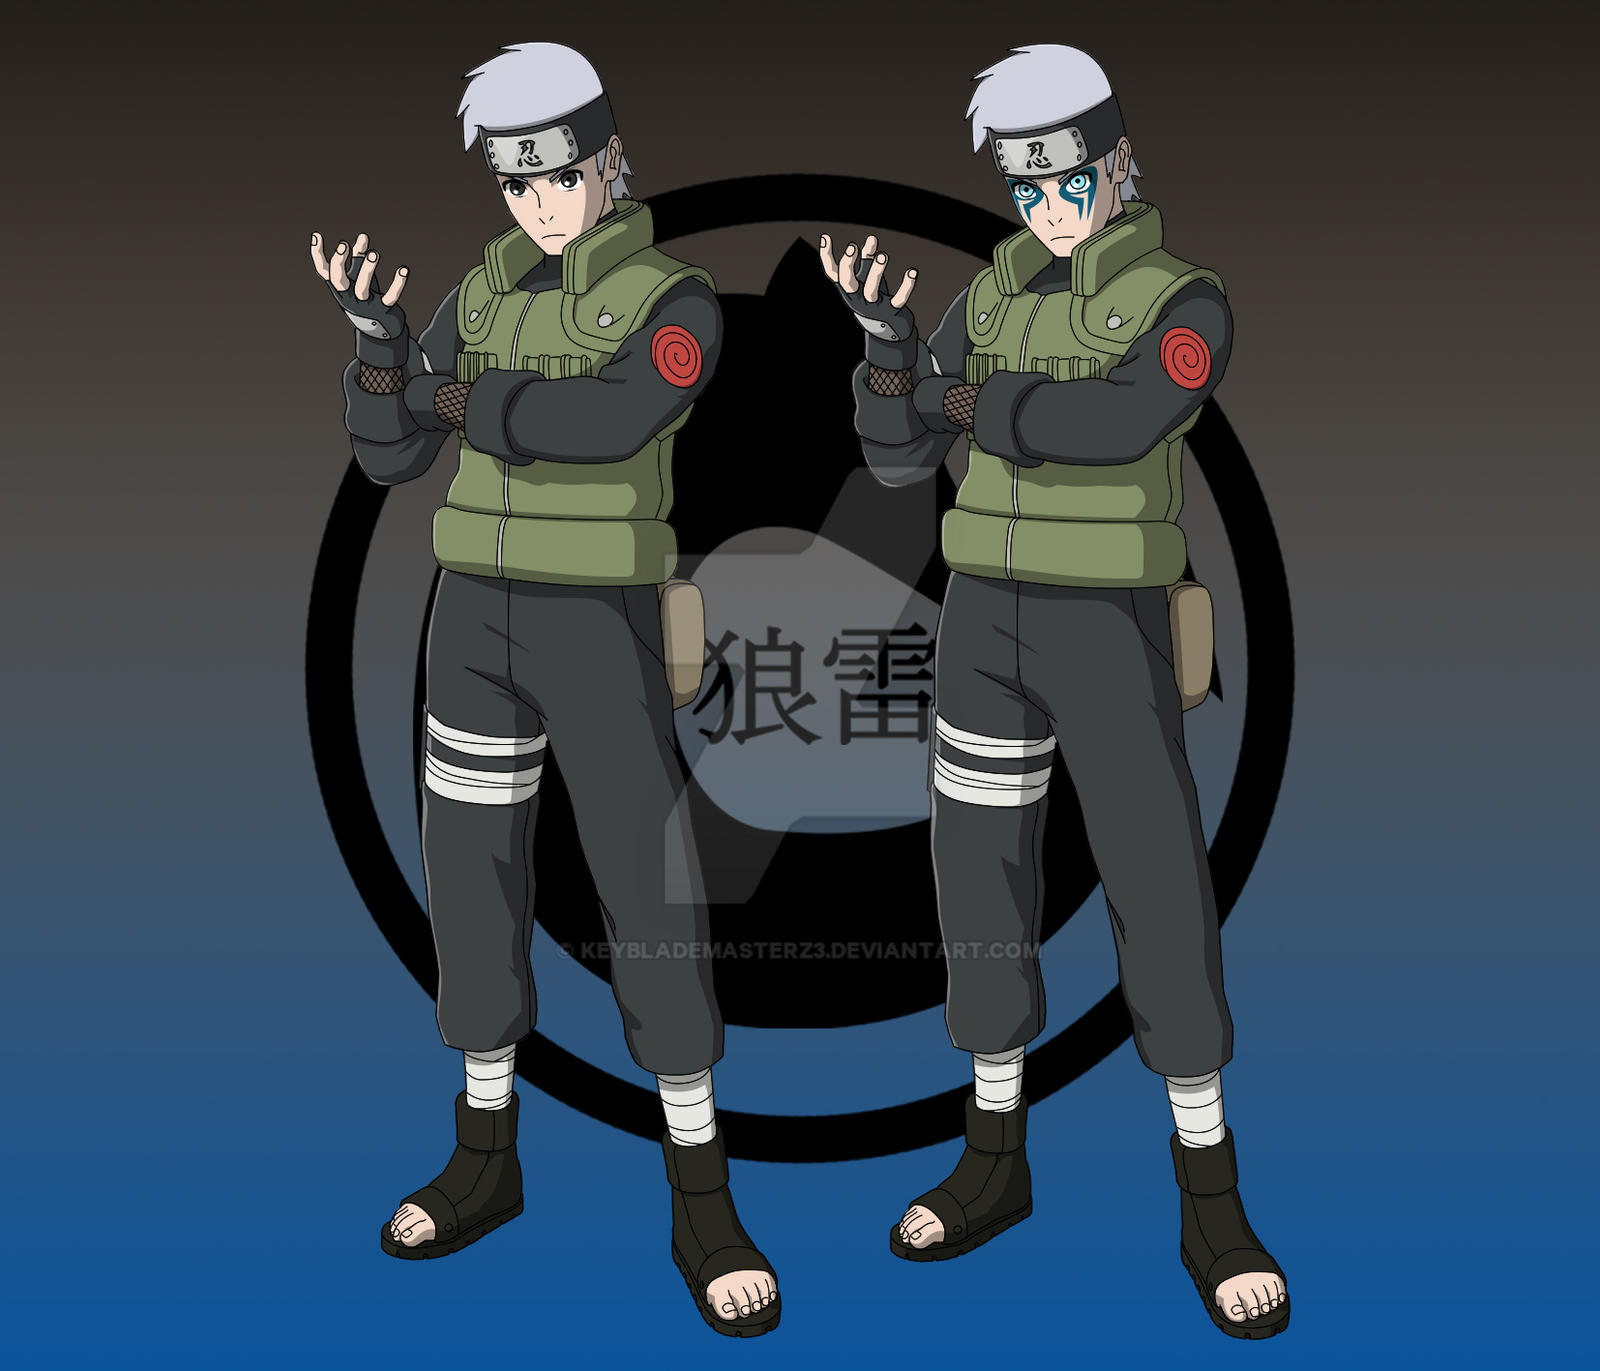 Naruto Oc Raiju Okami Fourth Great Ninja War By Keyblademasterz3 On Deviantart Concept for raiju in dota 2, created by shiroi okami. naruto oc raiju okami fourth great